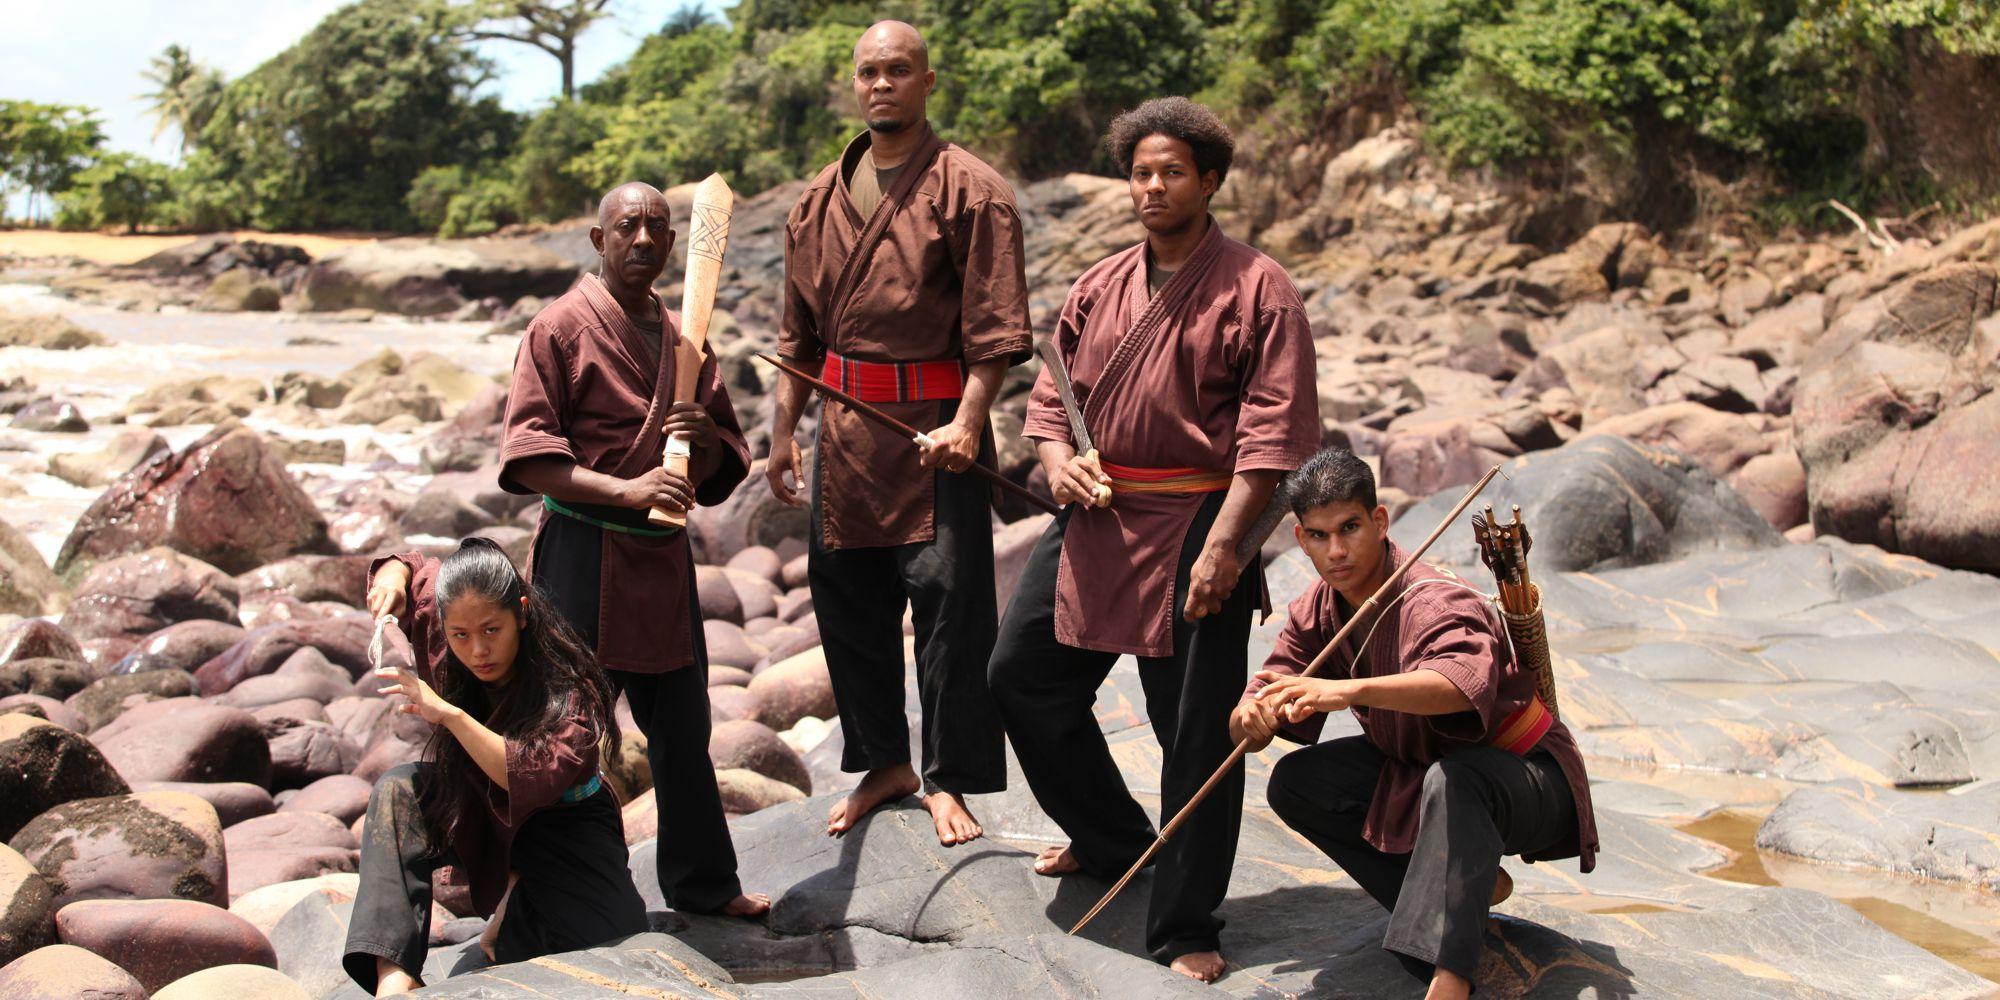 À la découverte de l'art martial Djokanavec Djoko Didier